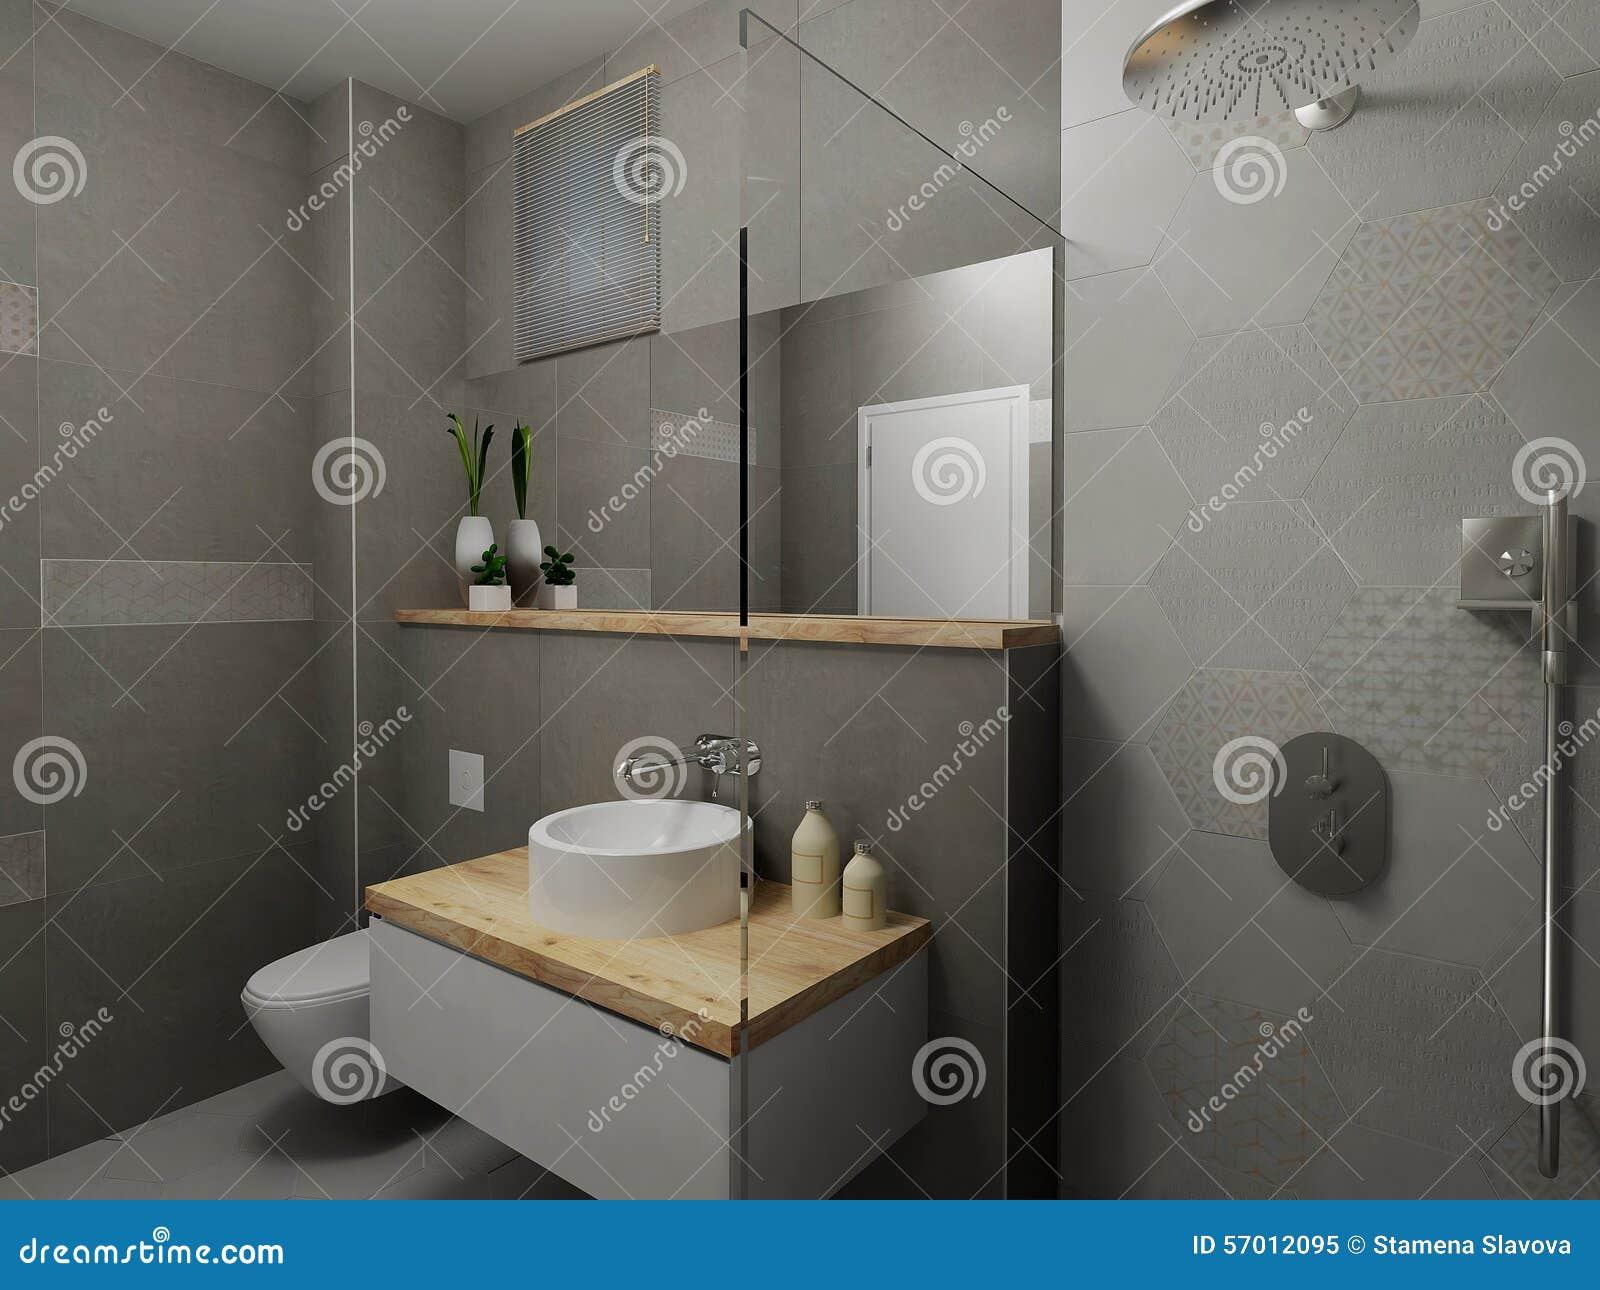 Modernes graues badezimmer stock abbildung illustration - Graues badezimmer ...